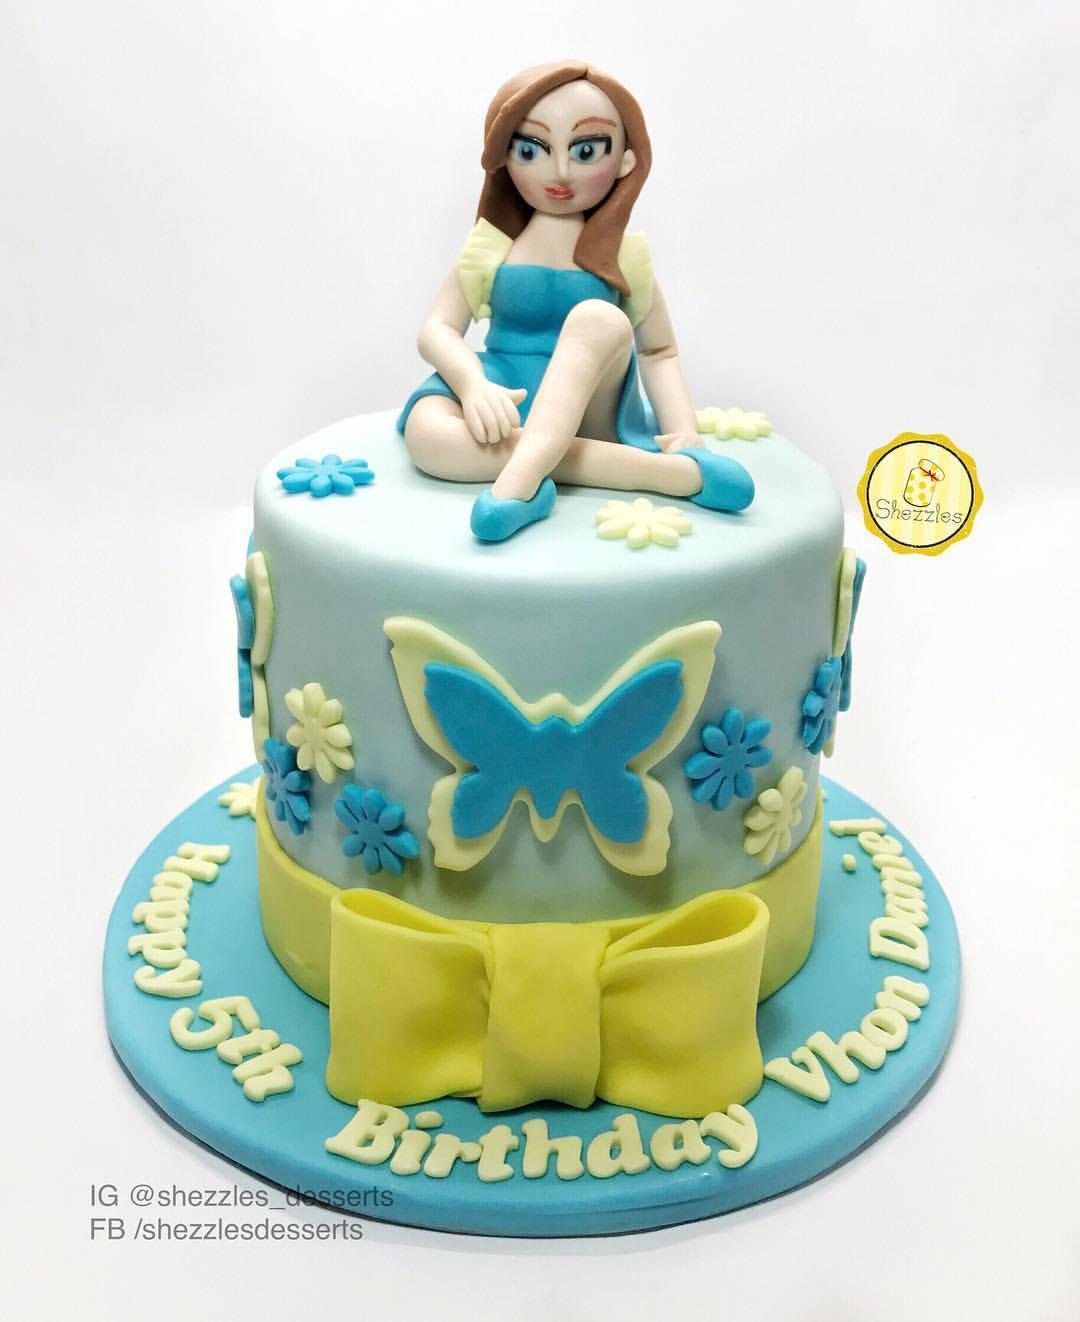 Shezzles Dessert In A Jar Doll Birthday Cake For Vhon Daniel